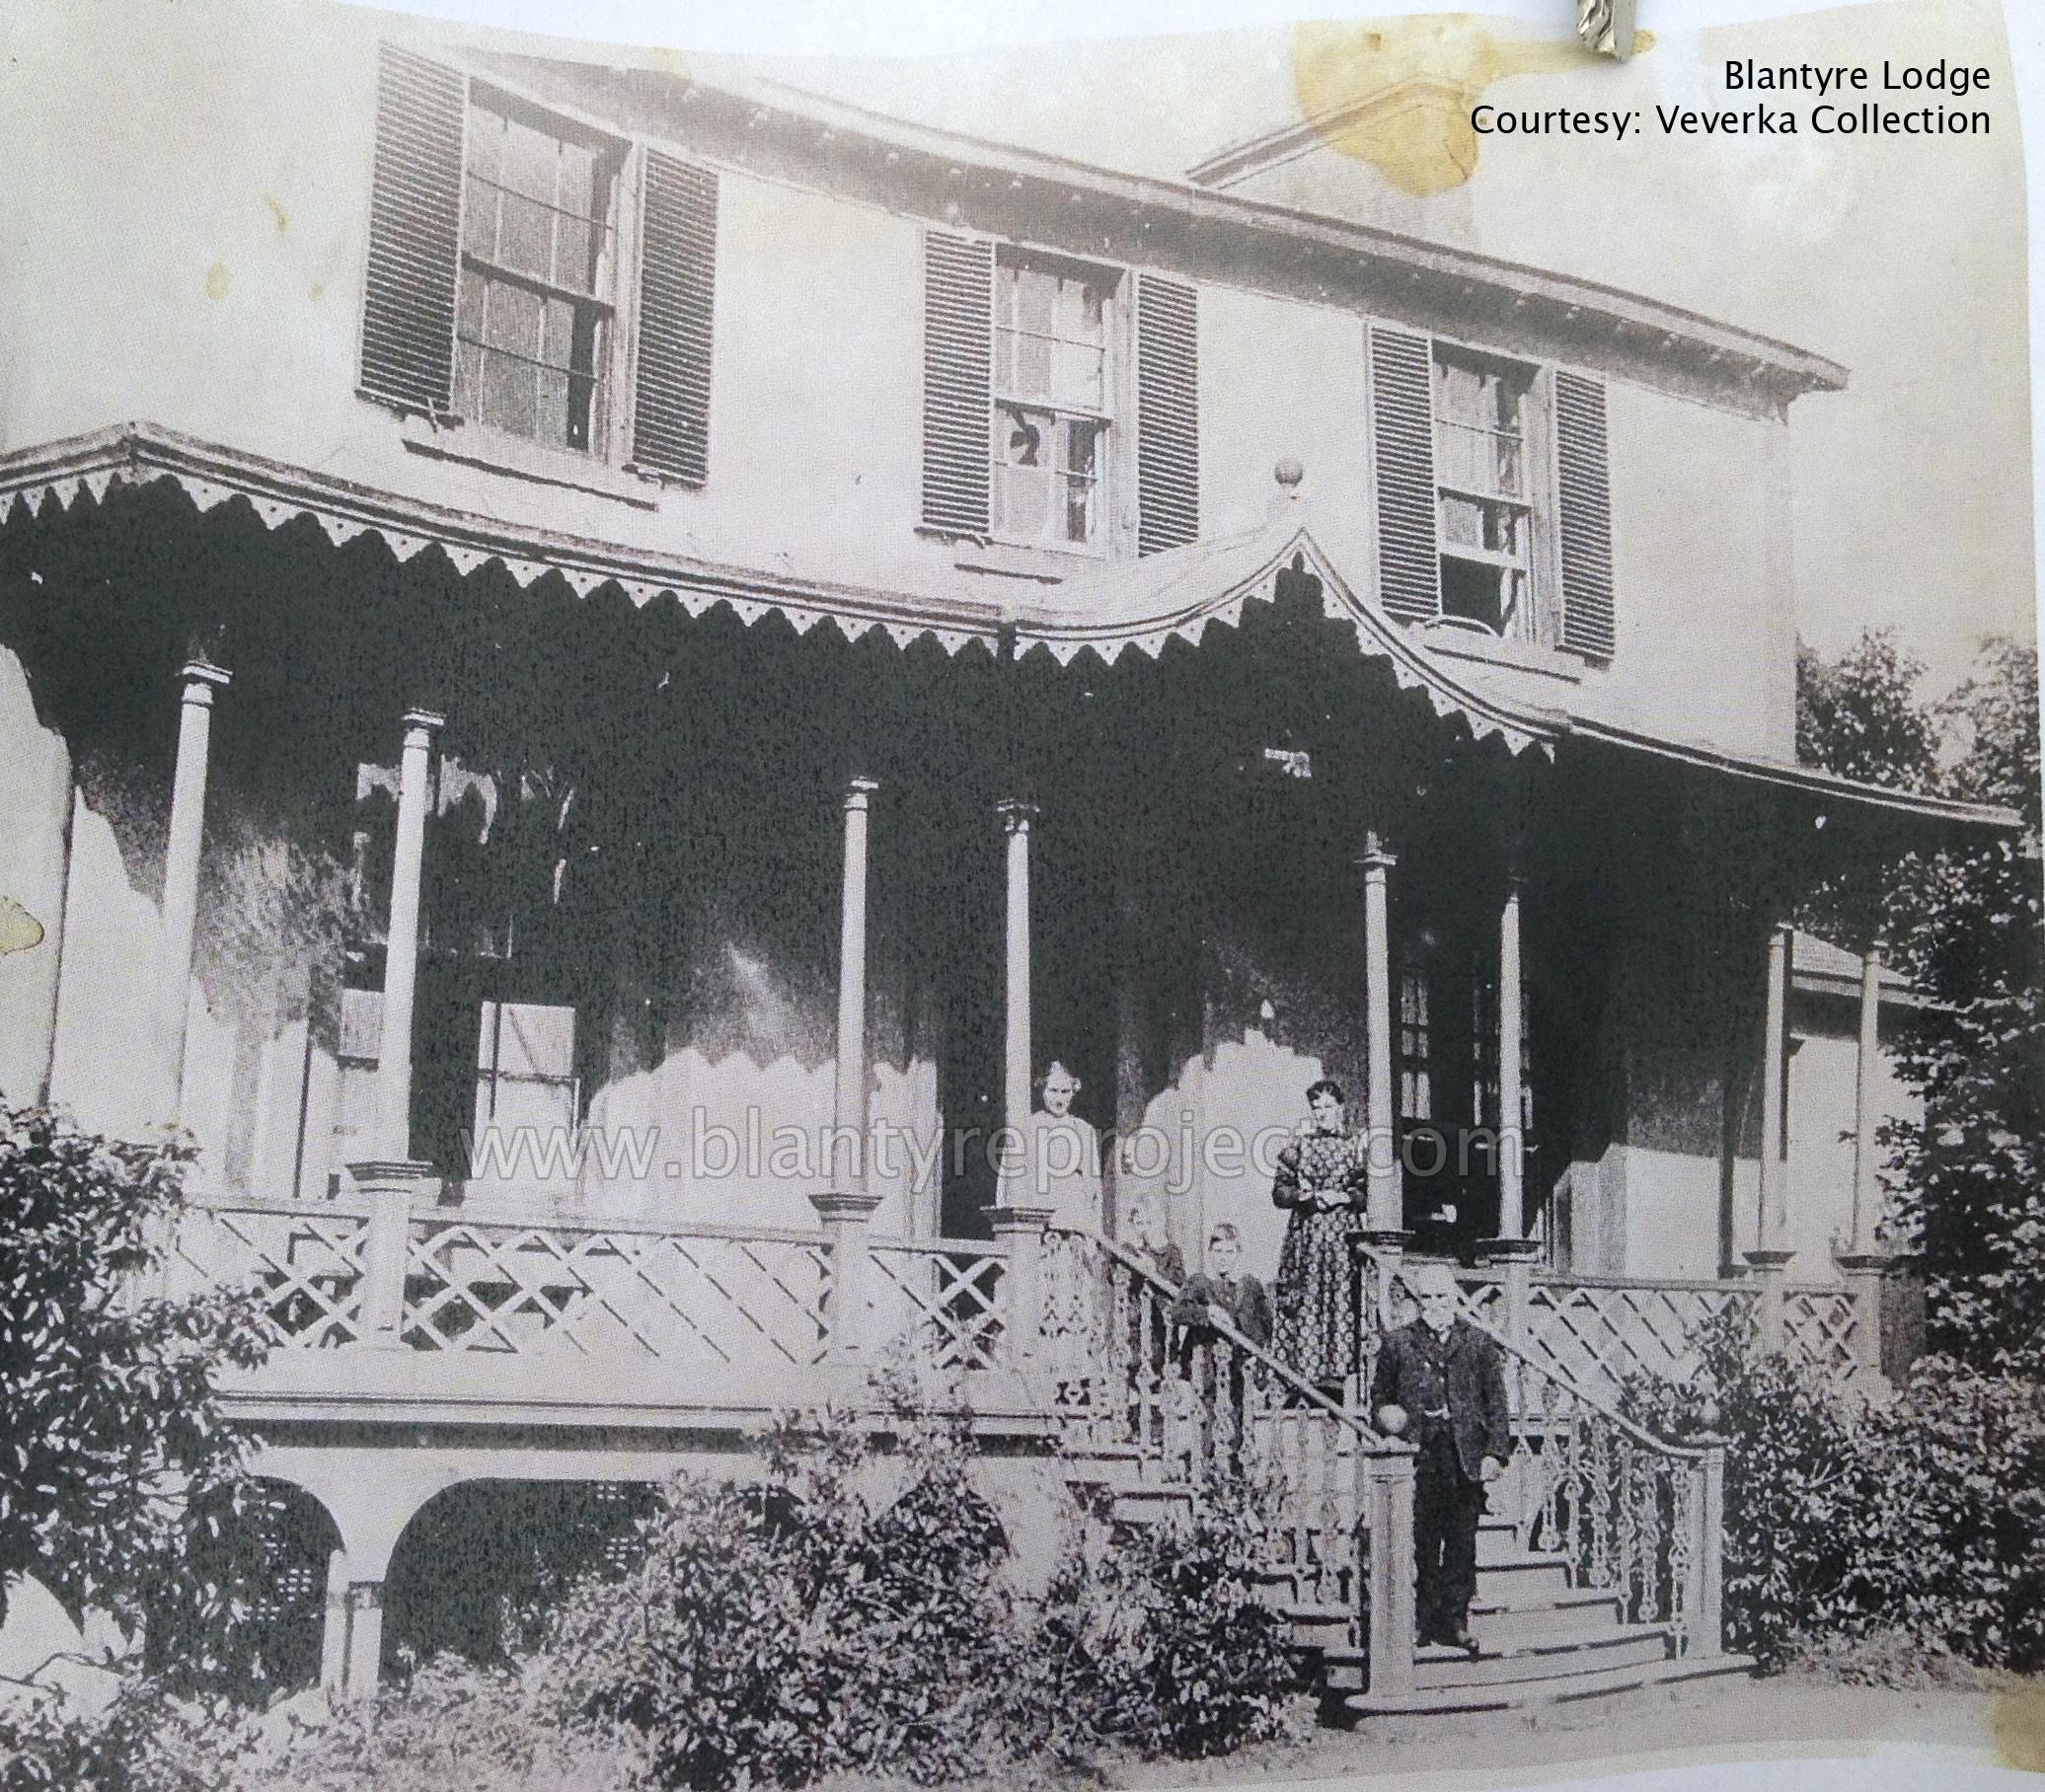 Blantyre Lodge